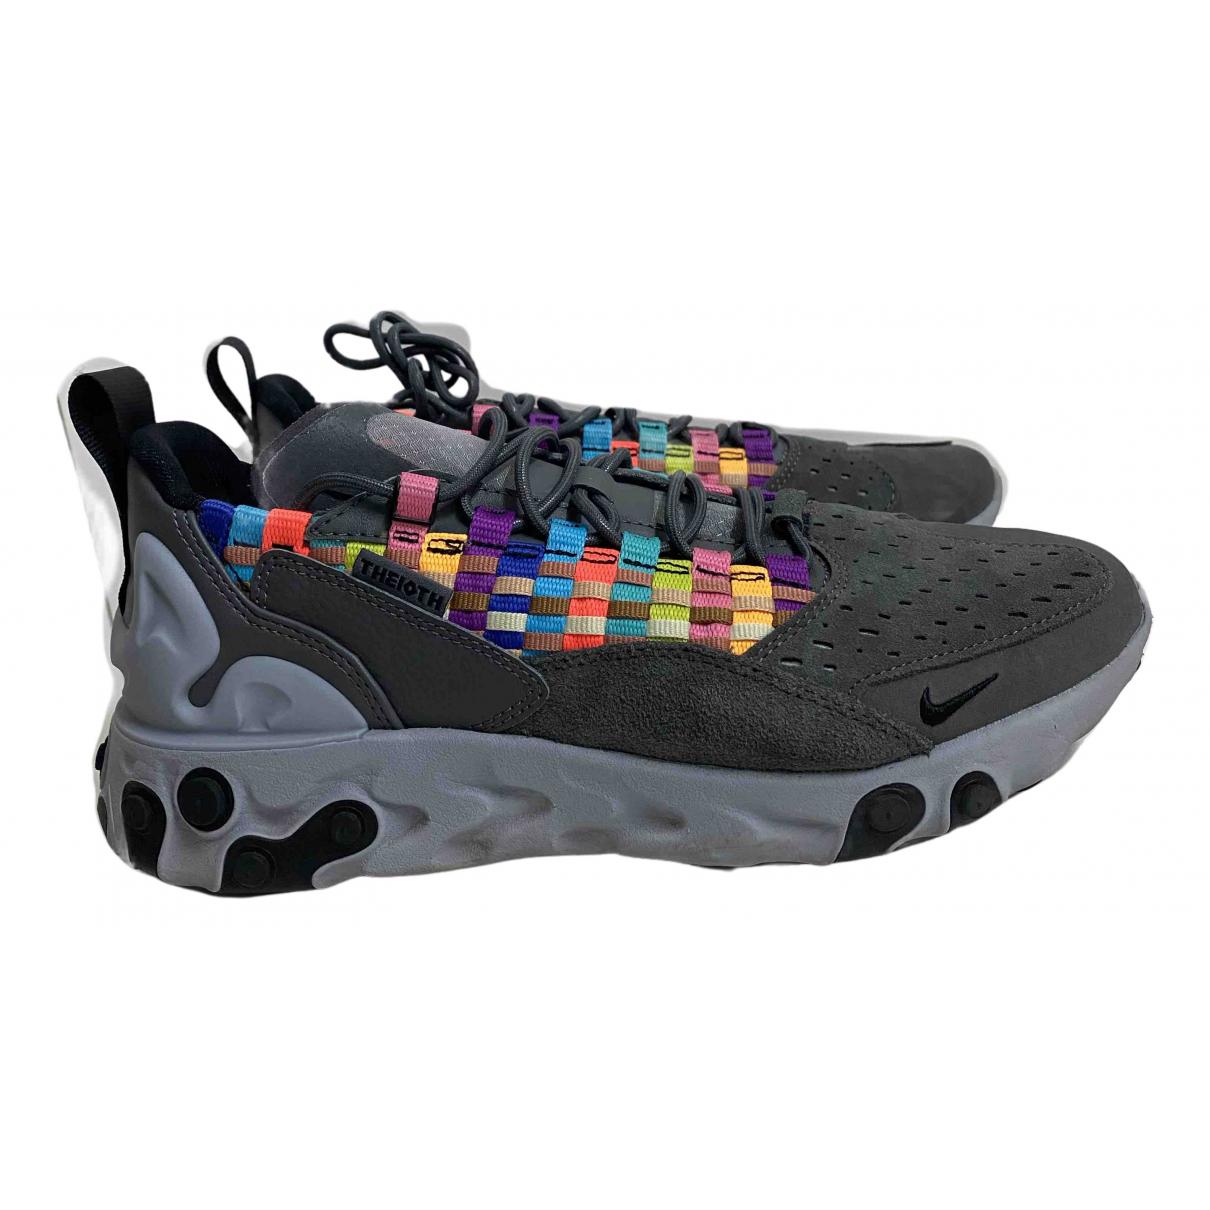 Nike \N Sneakers in  Anthrazit Leinen